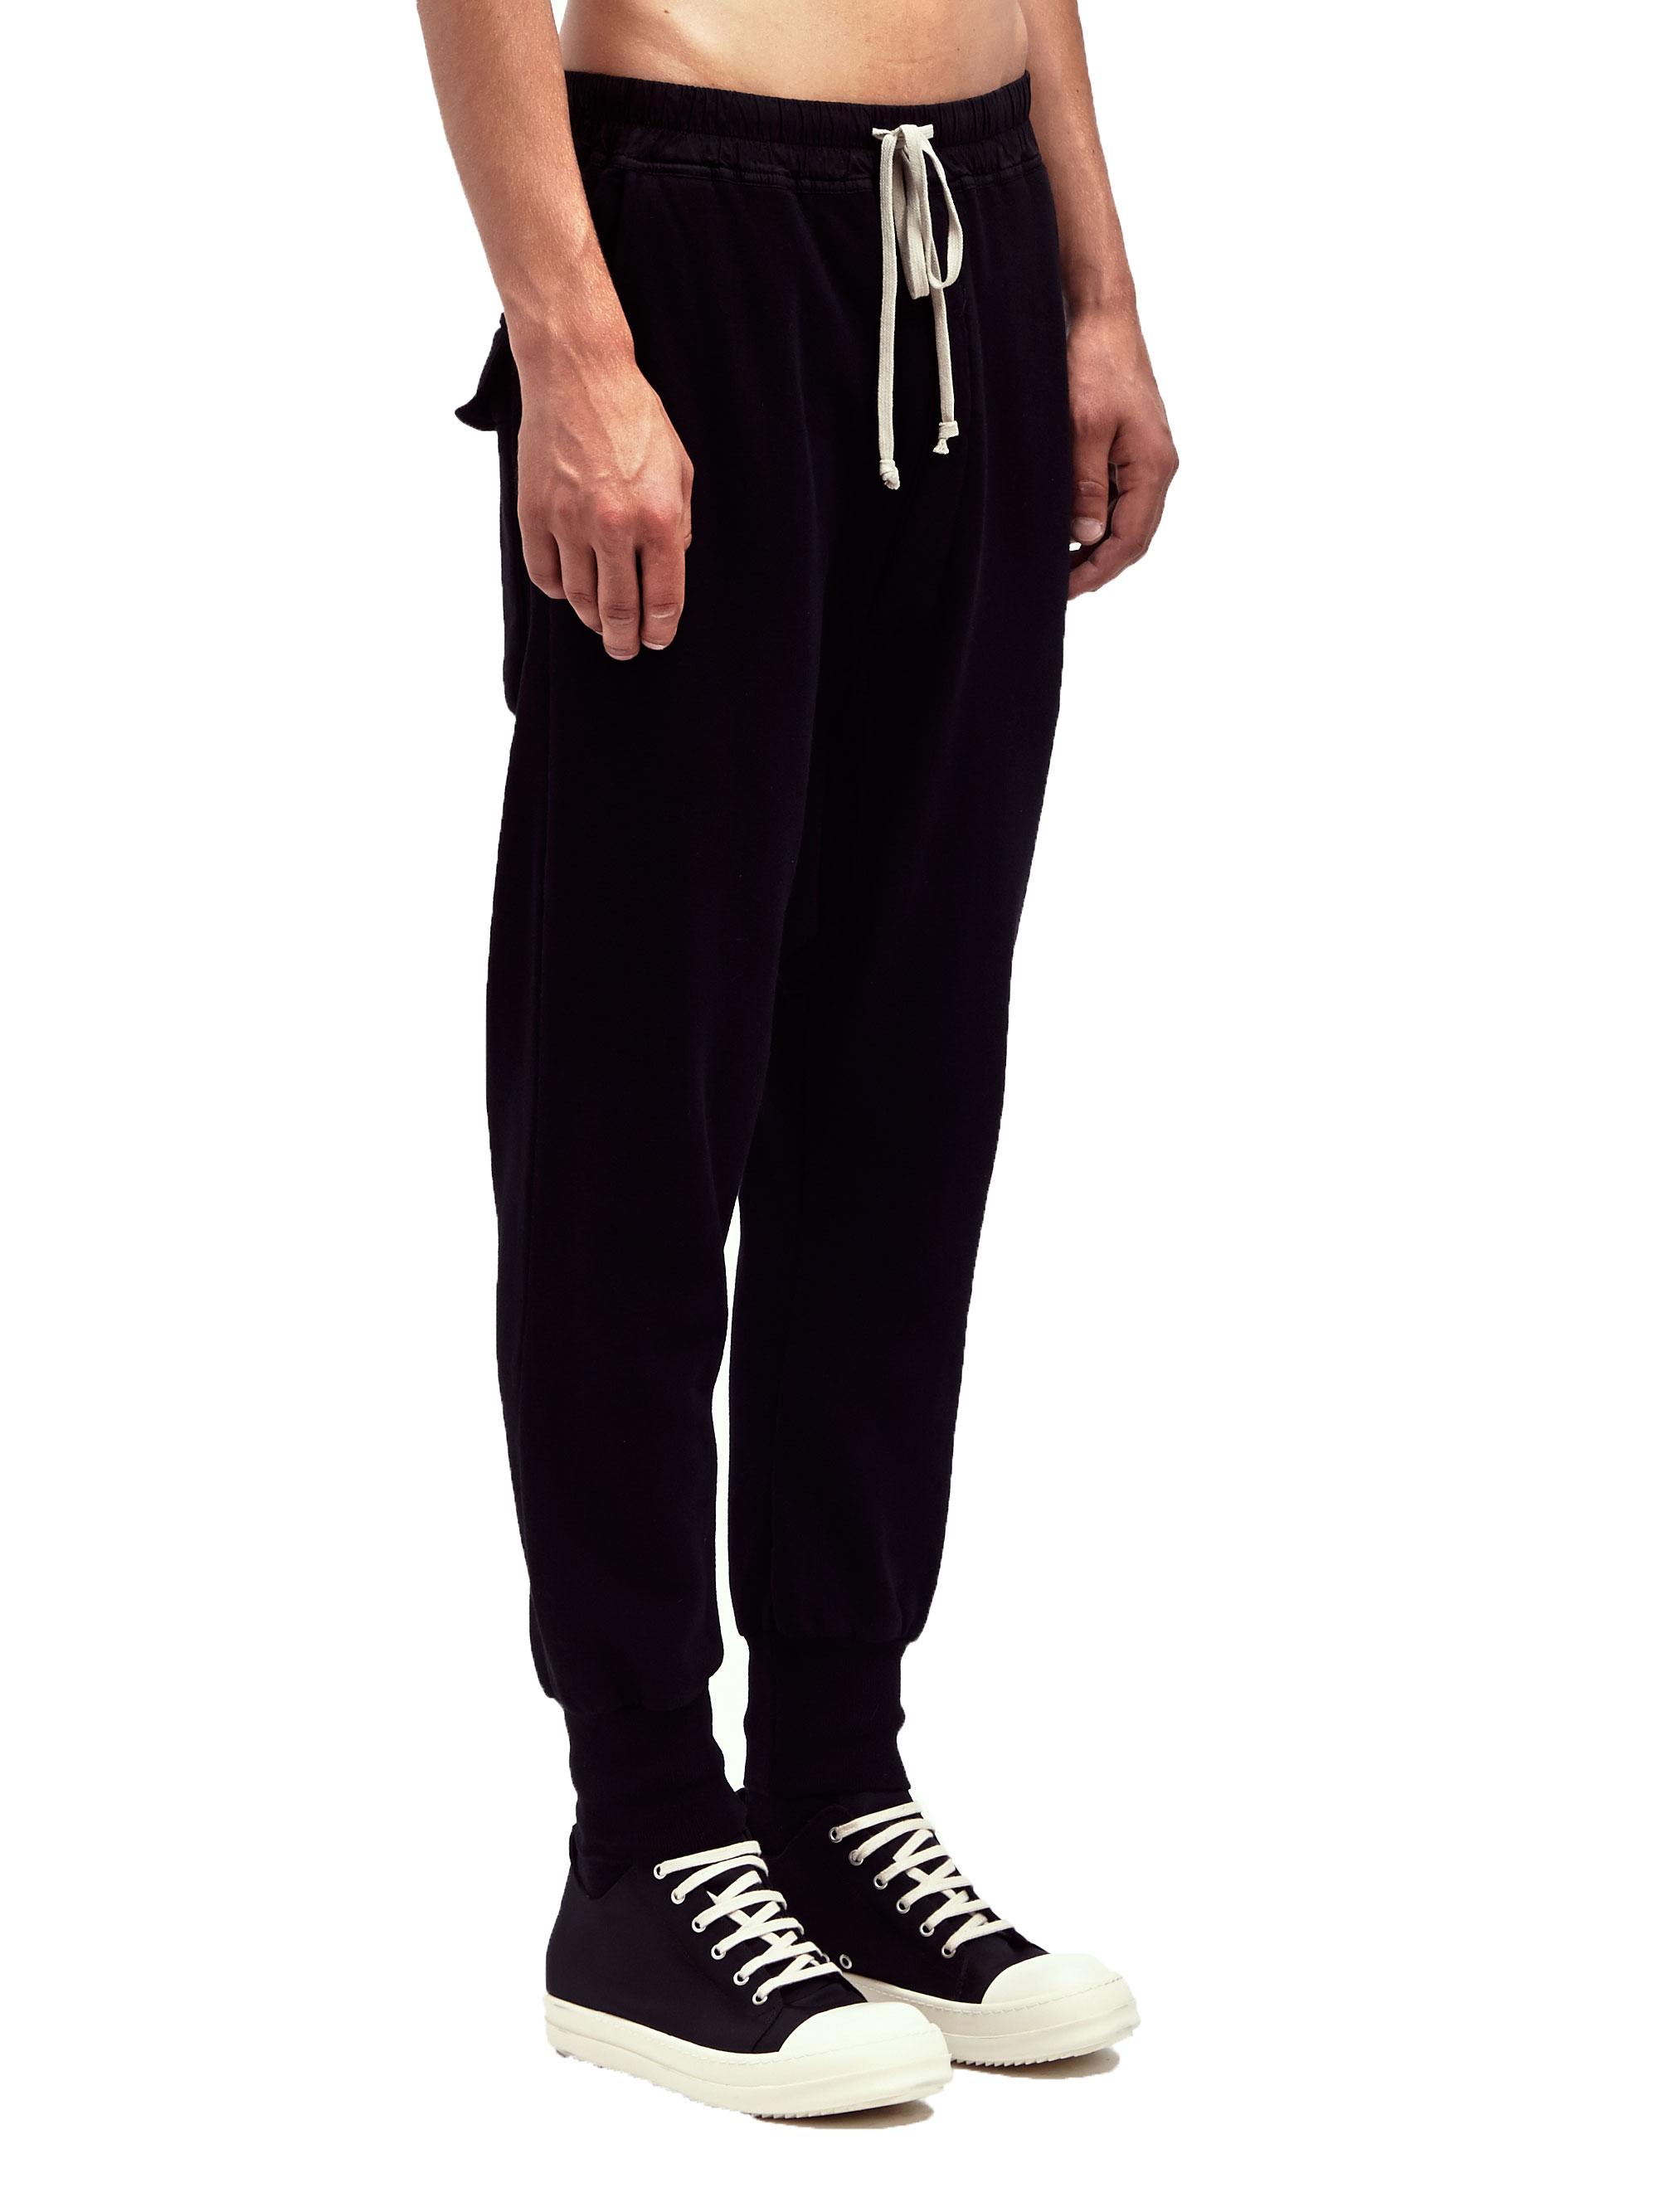 Sale Geniue Stockist Rick Owens Long Drawstring Pants in Black Discount Genuine Discount Find Great qTF5S07N